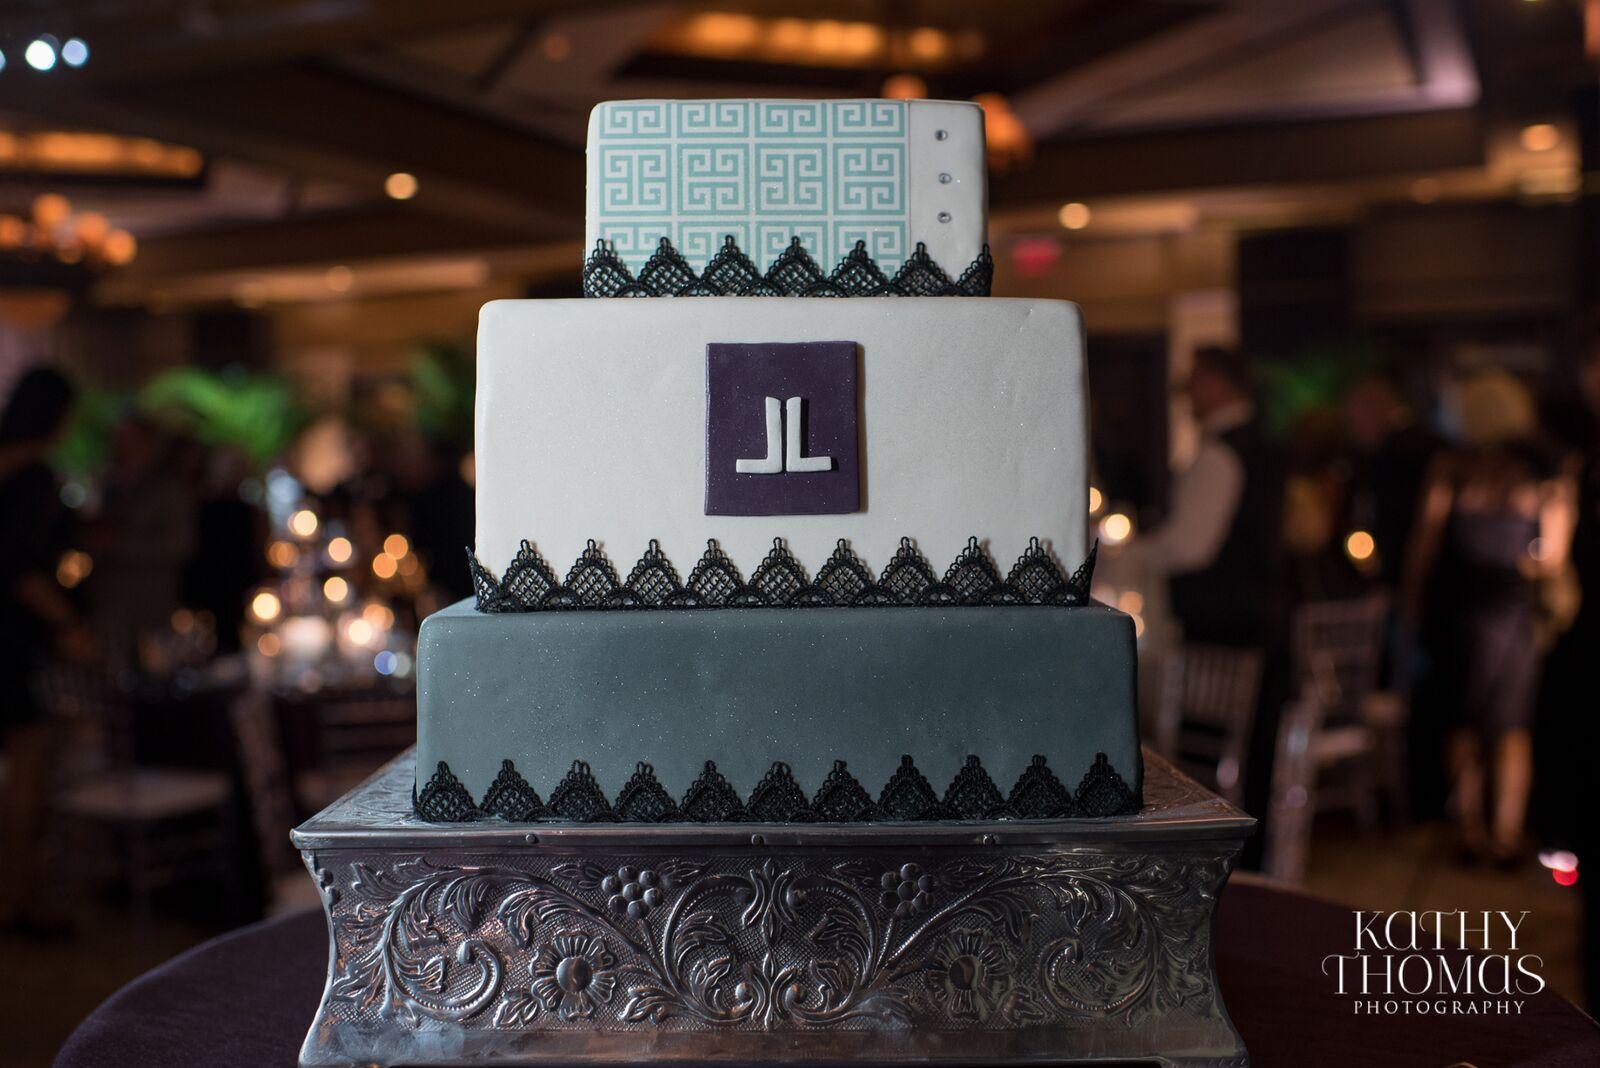 Lisa Stoner Events - Luxury Weddings - Orlando Weddings - Grand Bohemian Hotel - black tie wedding - same sex wedding - Marriage Equality  - Wedding Planner - plum and grey wedding - grey modern wedding cake.jpg